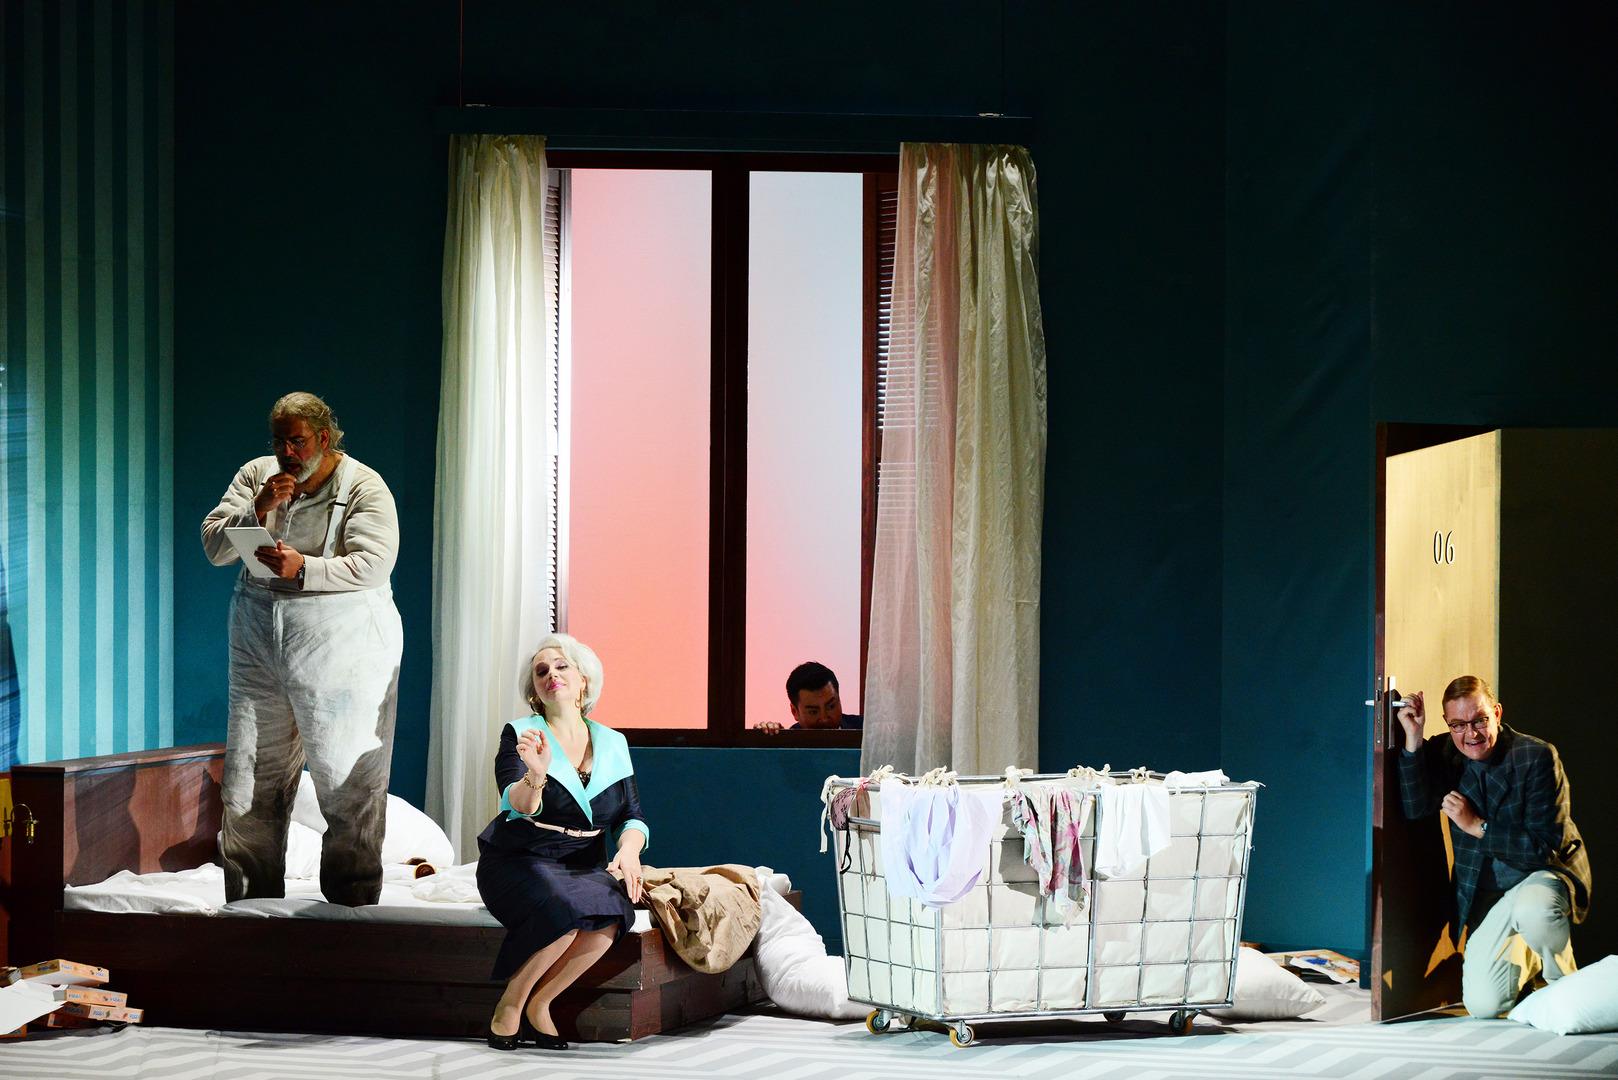 Falstaff-Opera-by-Giuseppe-Verdi-directed-by-Jacopo-Spirei- in-Karlsruhe-9